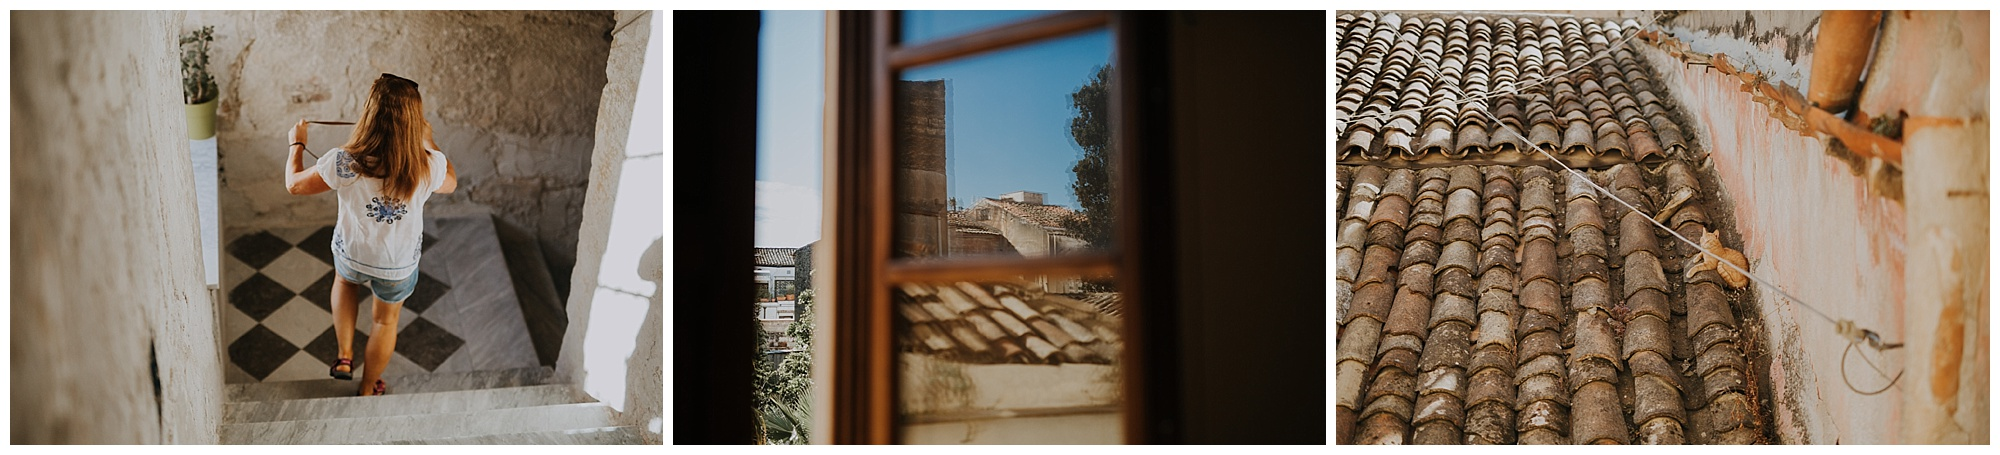 palmero window reflections